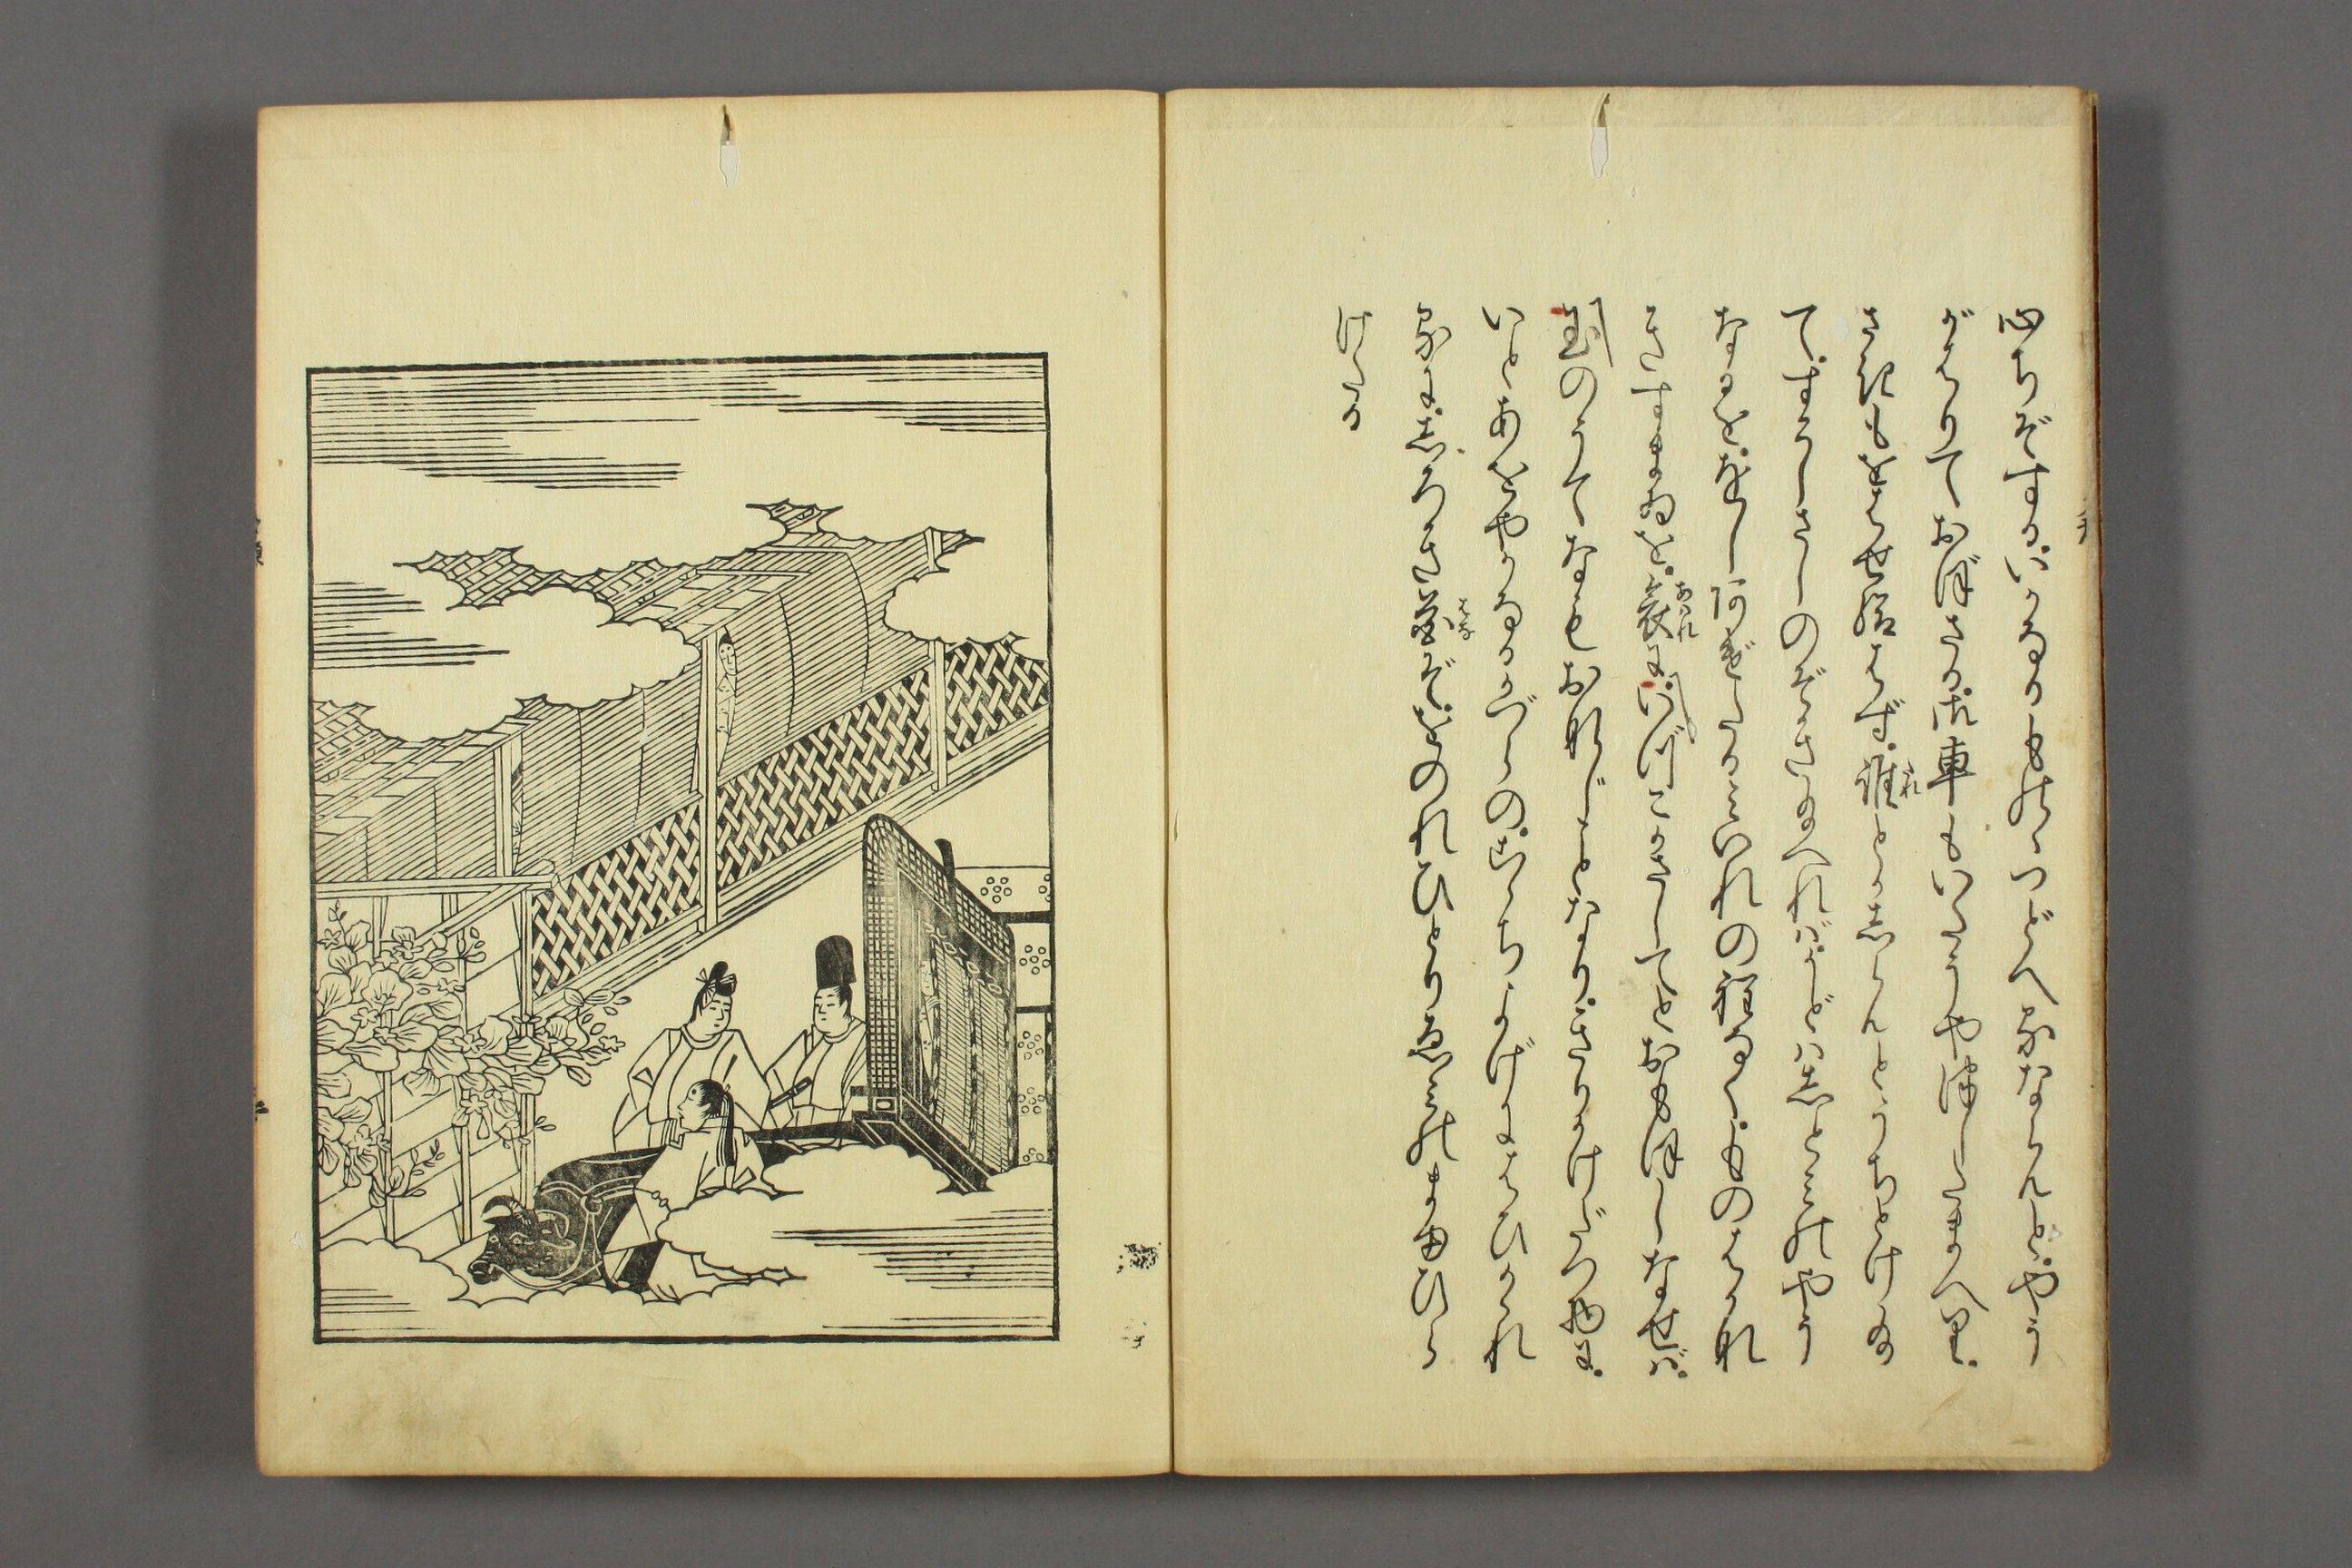 http://archive.wul.waseda.ac.jp/kosho/bunko30/bunko30_a0007/bunko30_a0007_0004/bunko30_a0007_0004_p0003.jpg